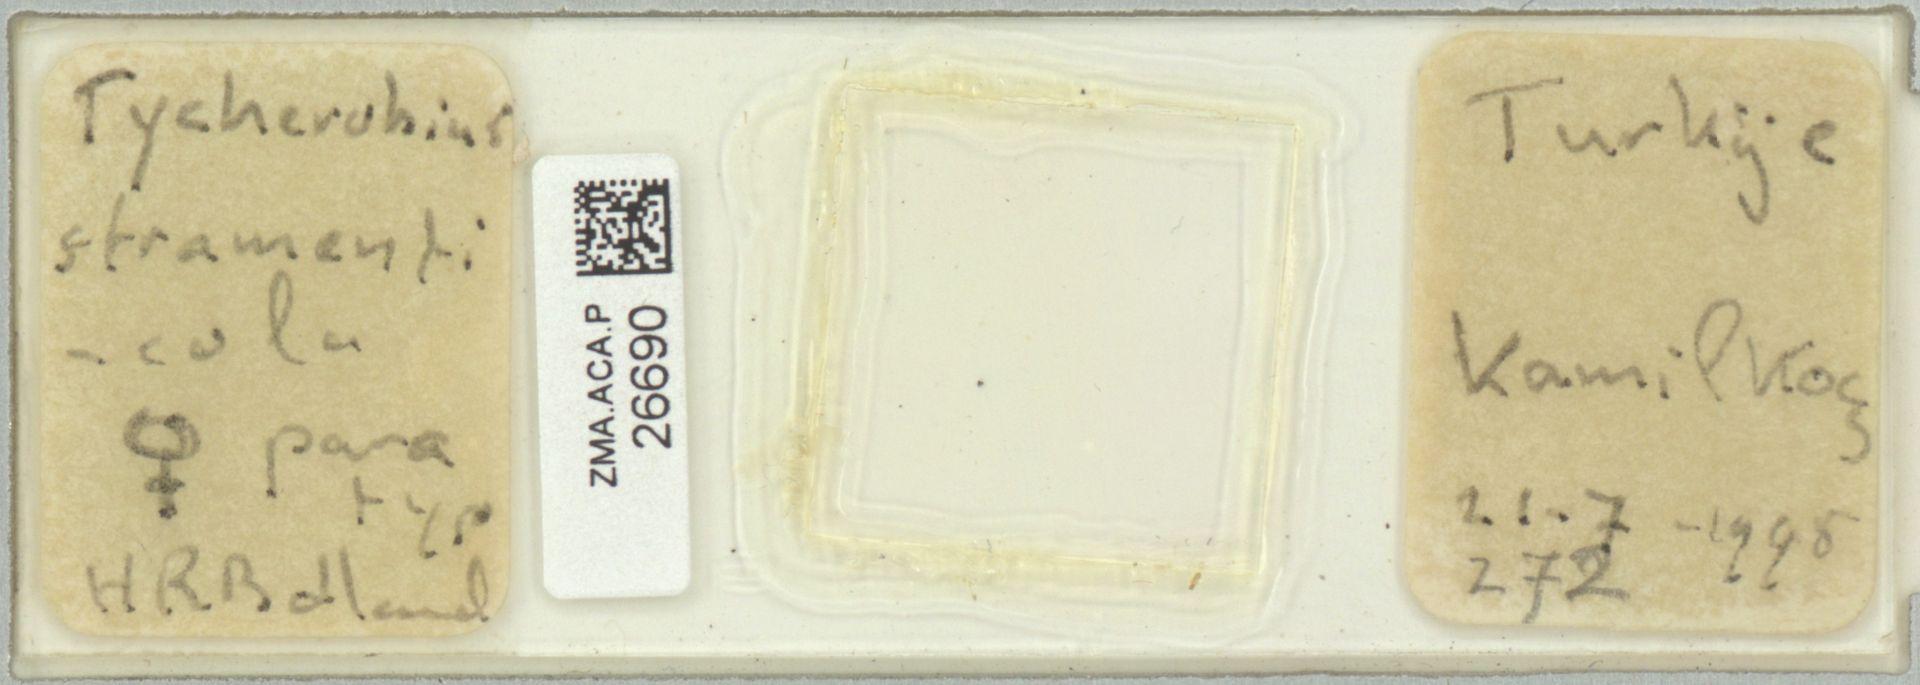 ZMA.ACA.P.26690 | Tycherobius stramenticola